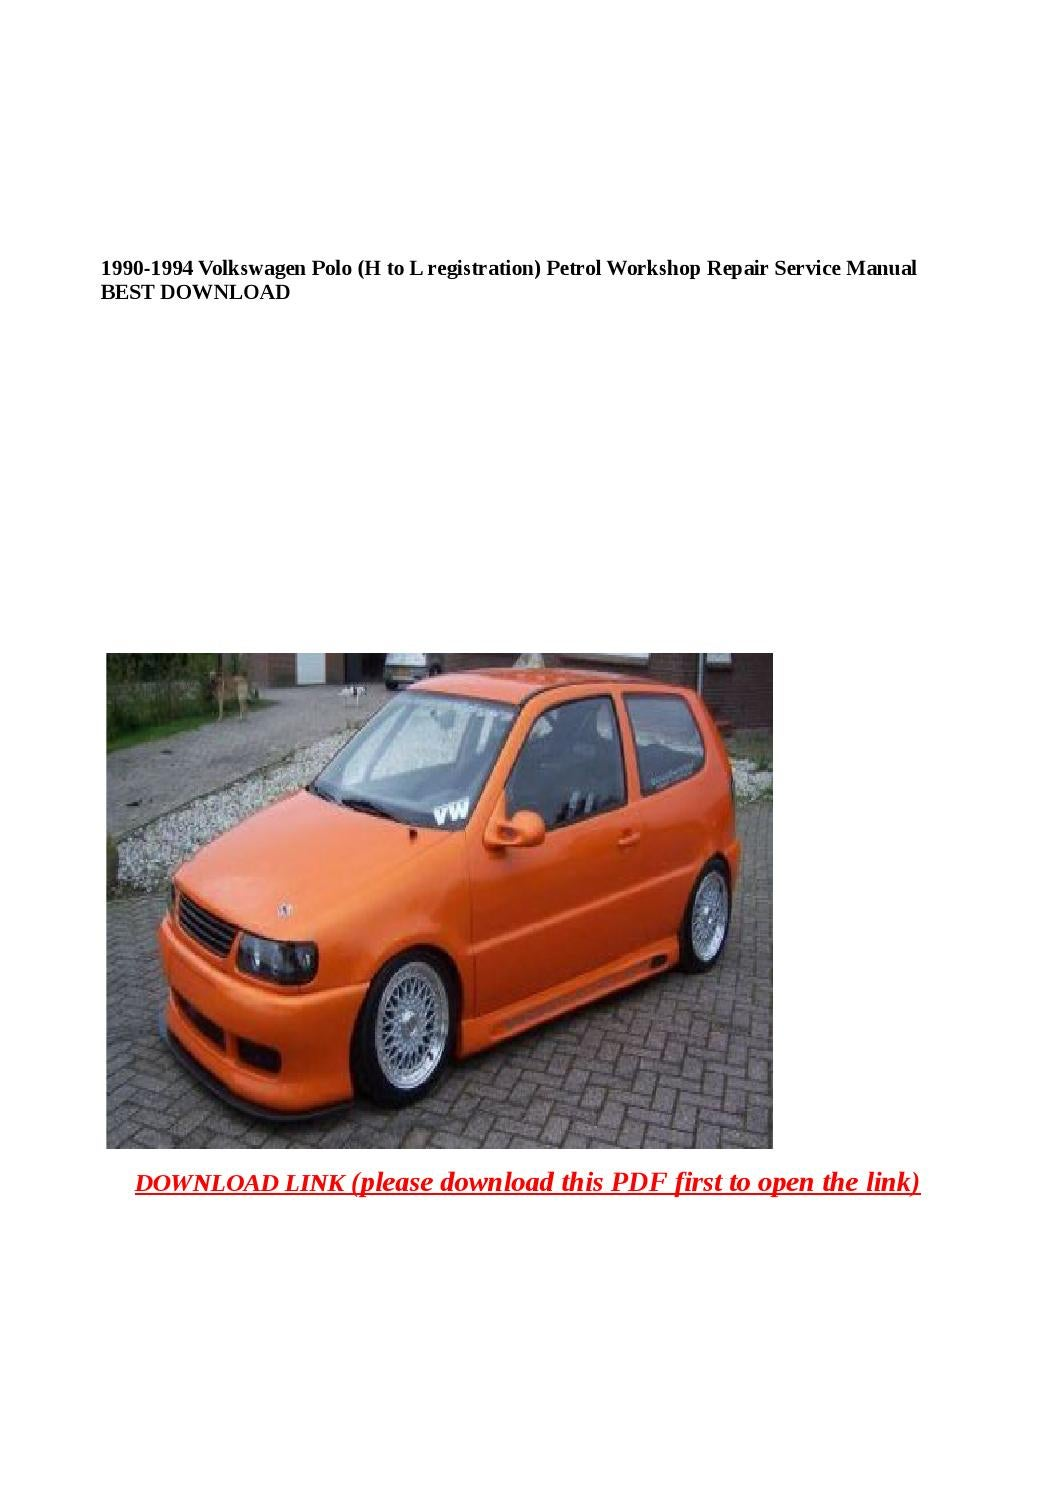 1990 1994 Volkswagen Polo  H To L Registration  Petrol Workshop Repair Service Manual Best